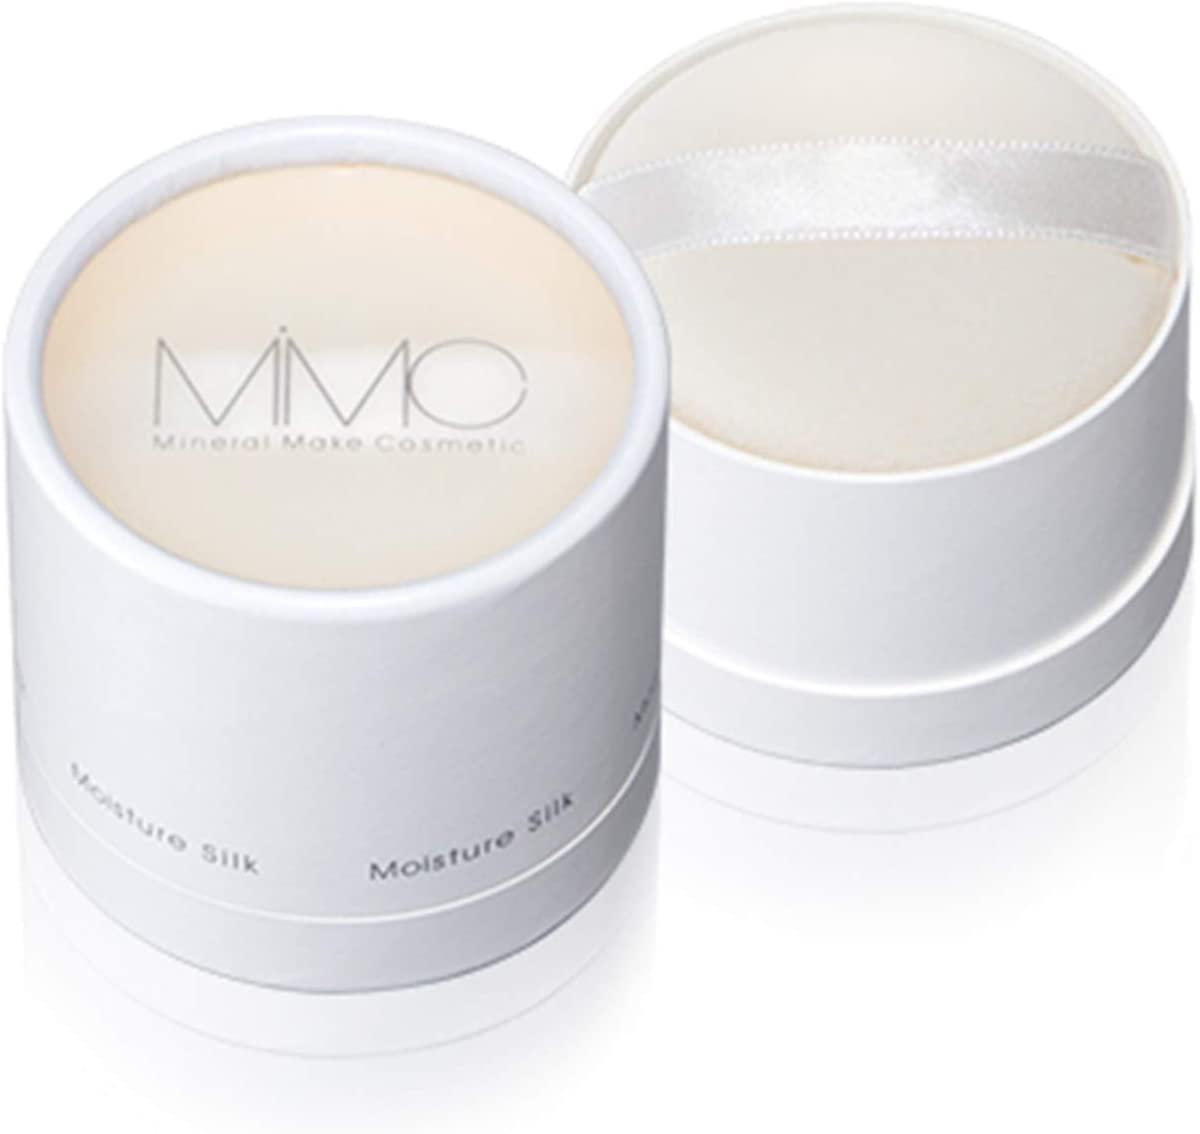 MiMC(エムアイエムシー)モイスチュアシルクの商品画像